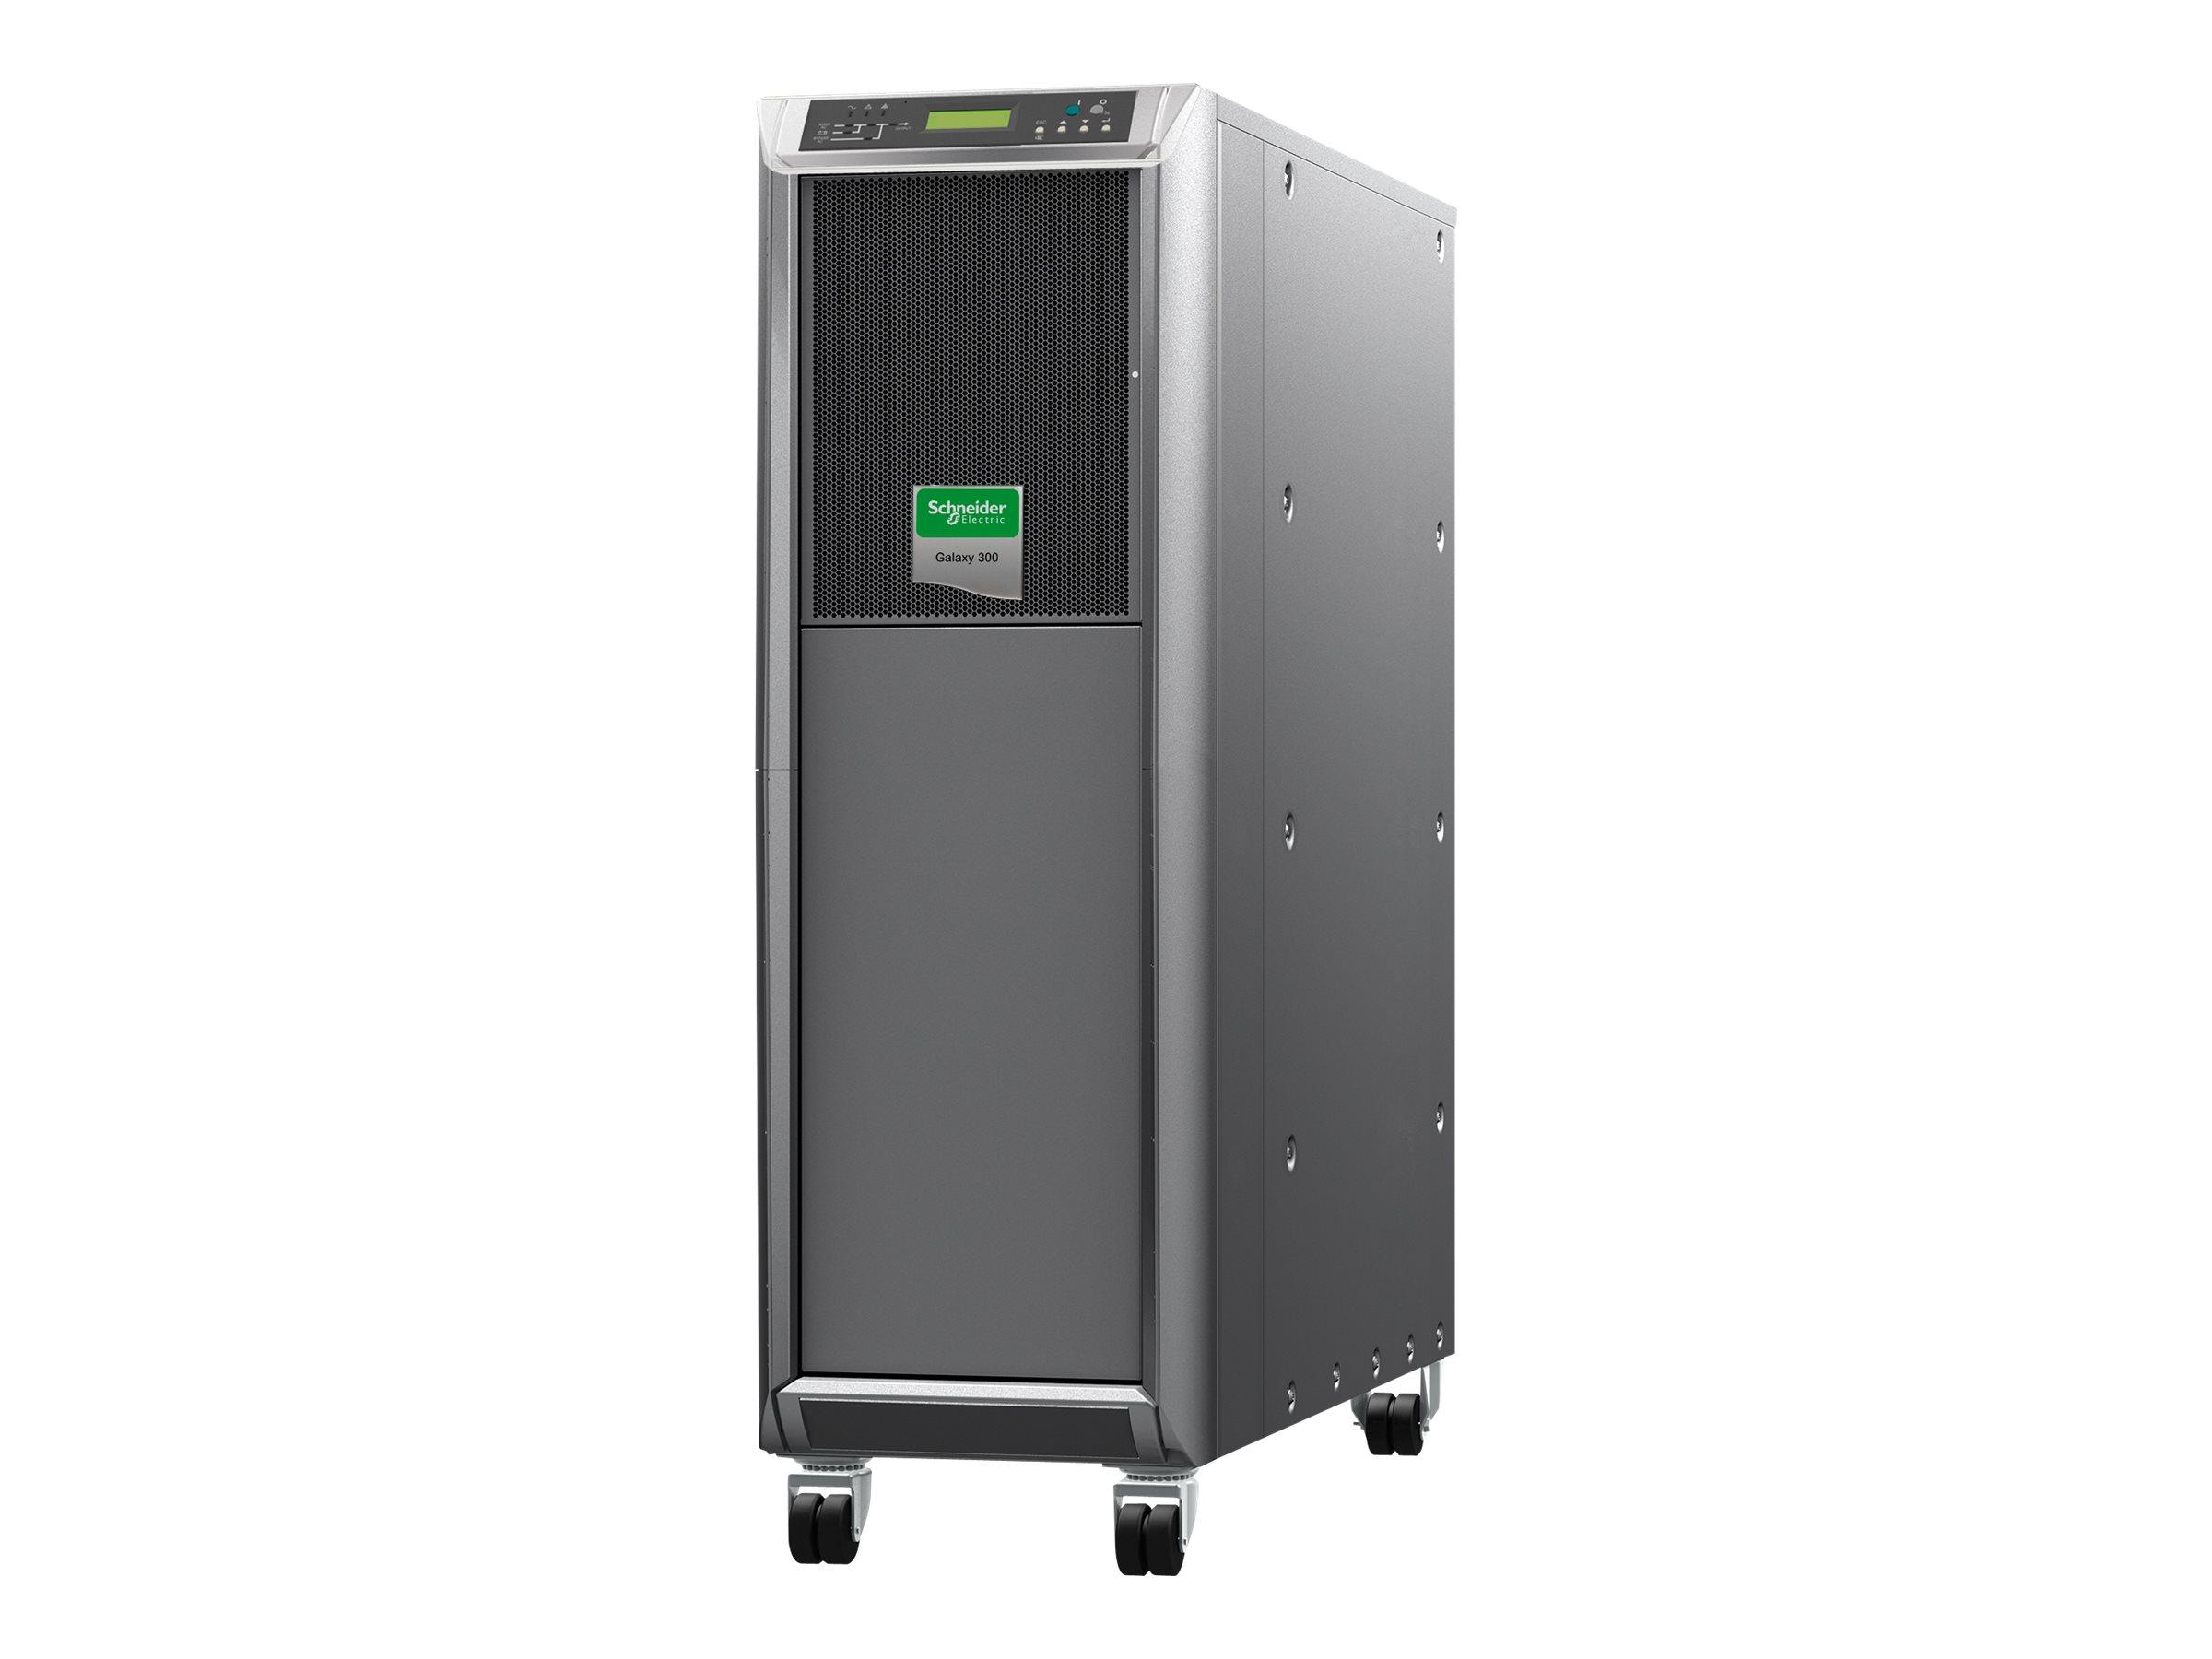 MGE Galaxy 300 - USV - Wechselstrom 380/400/415 V - 12 kW - 15000 VA - 3 Phasen